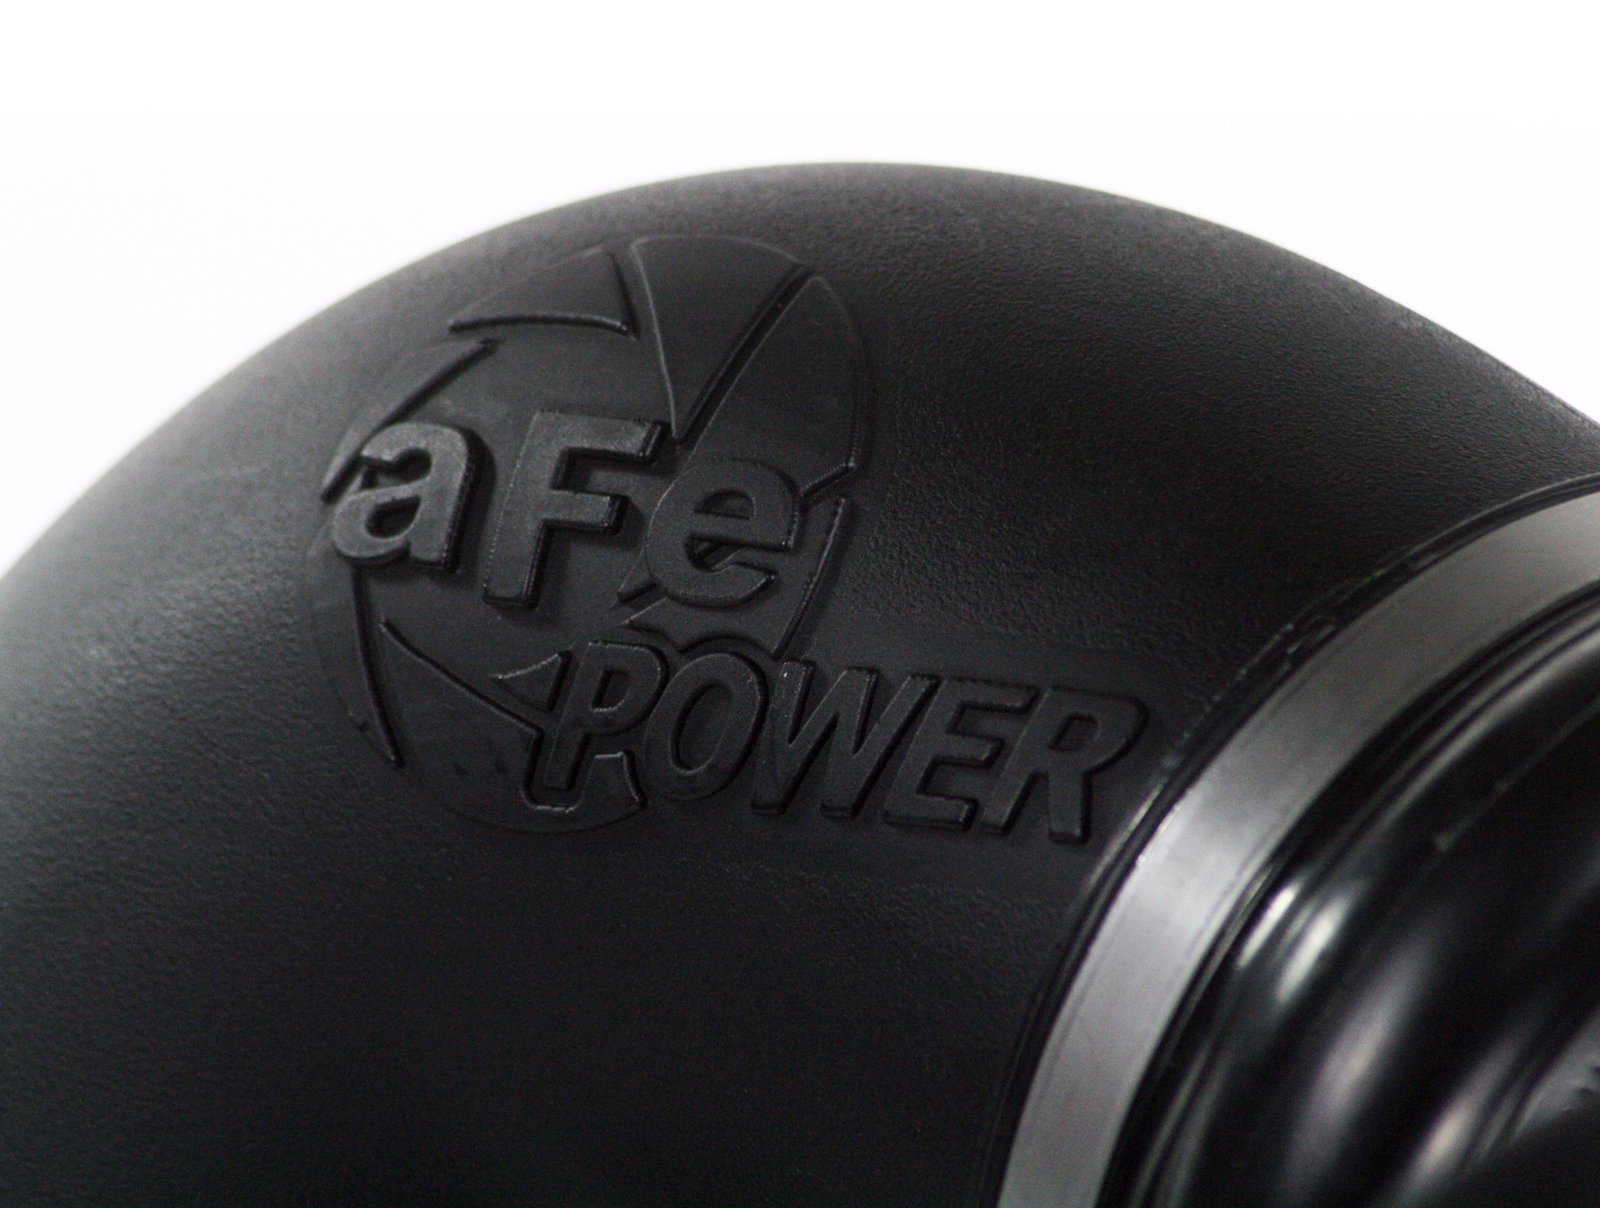 aFe Power Magnum FORCE 75-82032 Dodge Diesel Trucks 10-12 L6-6.7L (td) Performance Intake System (Oiled, 7-Layer Filter) by aFe Power (Image #2)